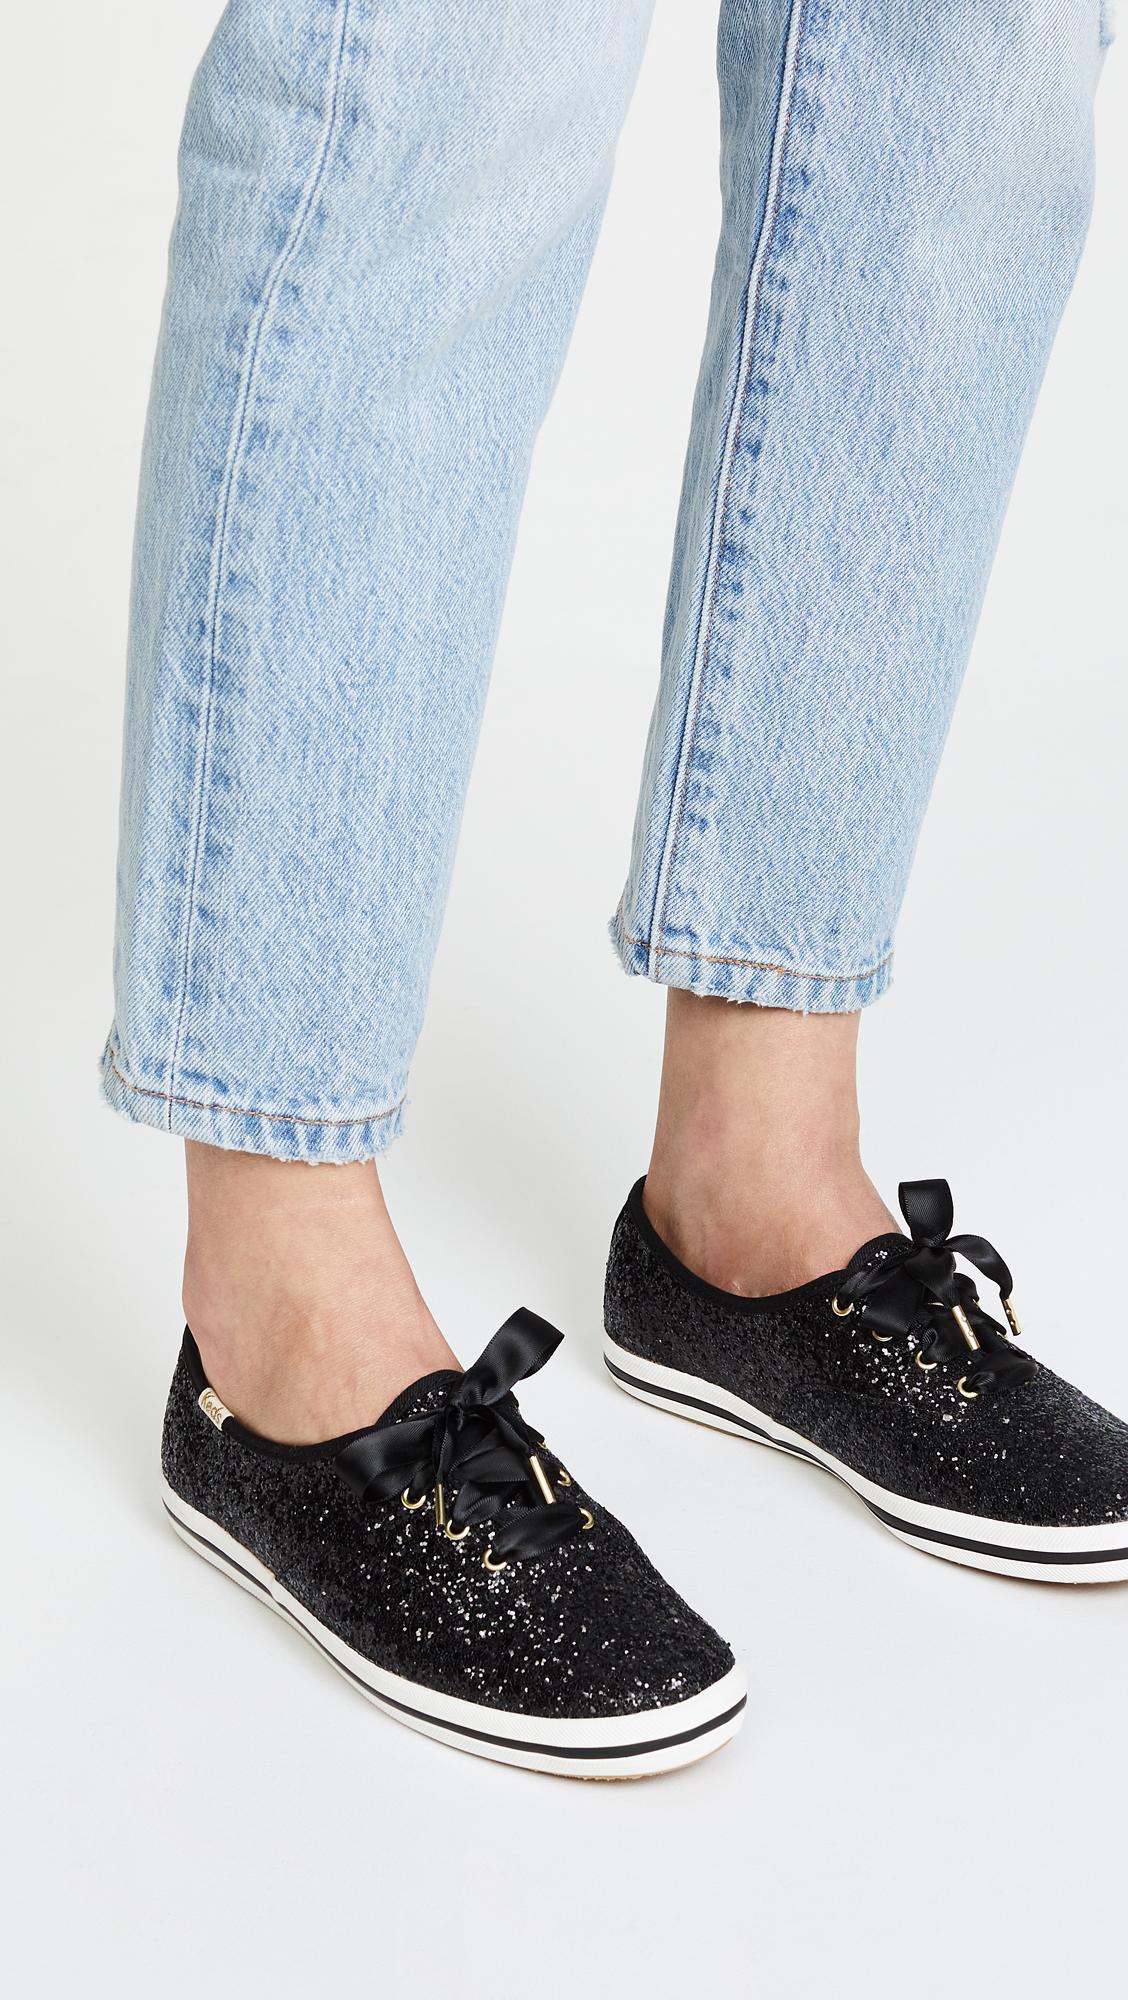 946d2164a737 Keds x Kate Spade New York Glitter Sneakers